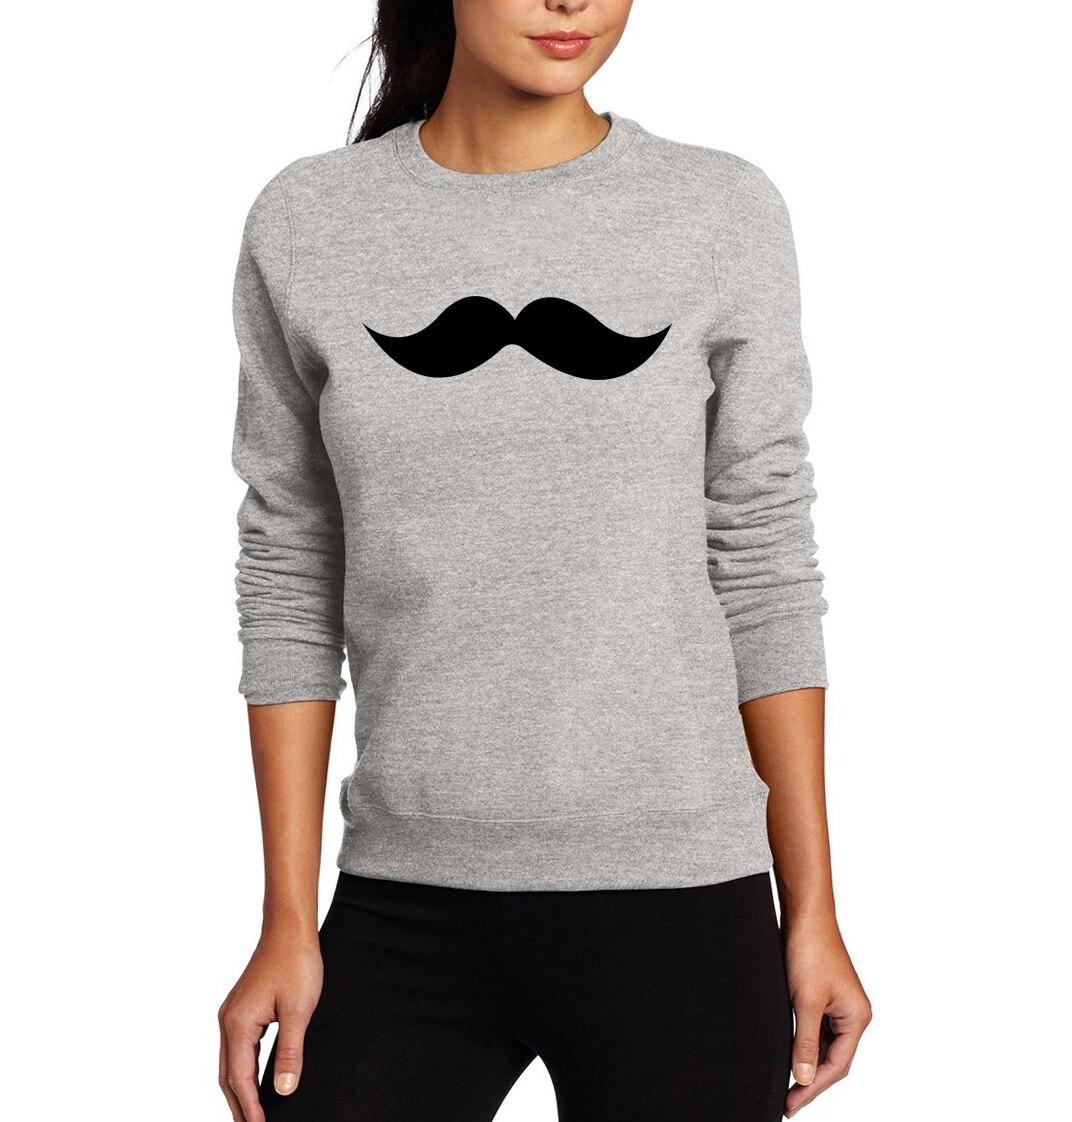 Moustache Print Sweatshirts  2